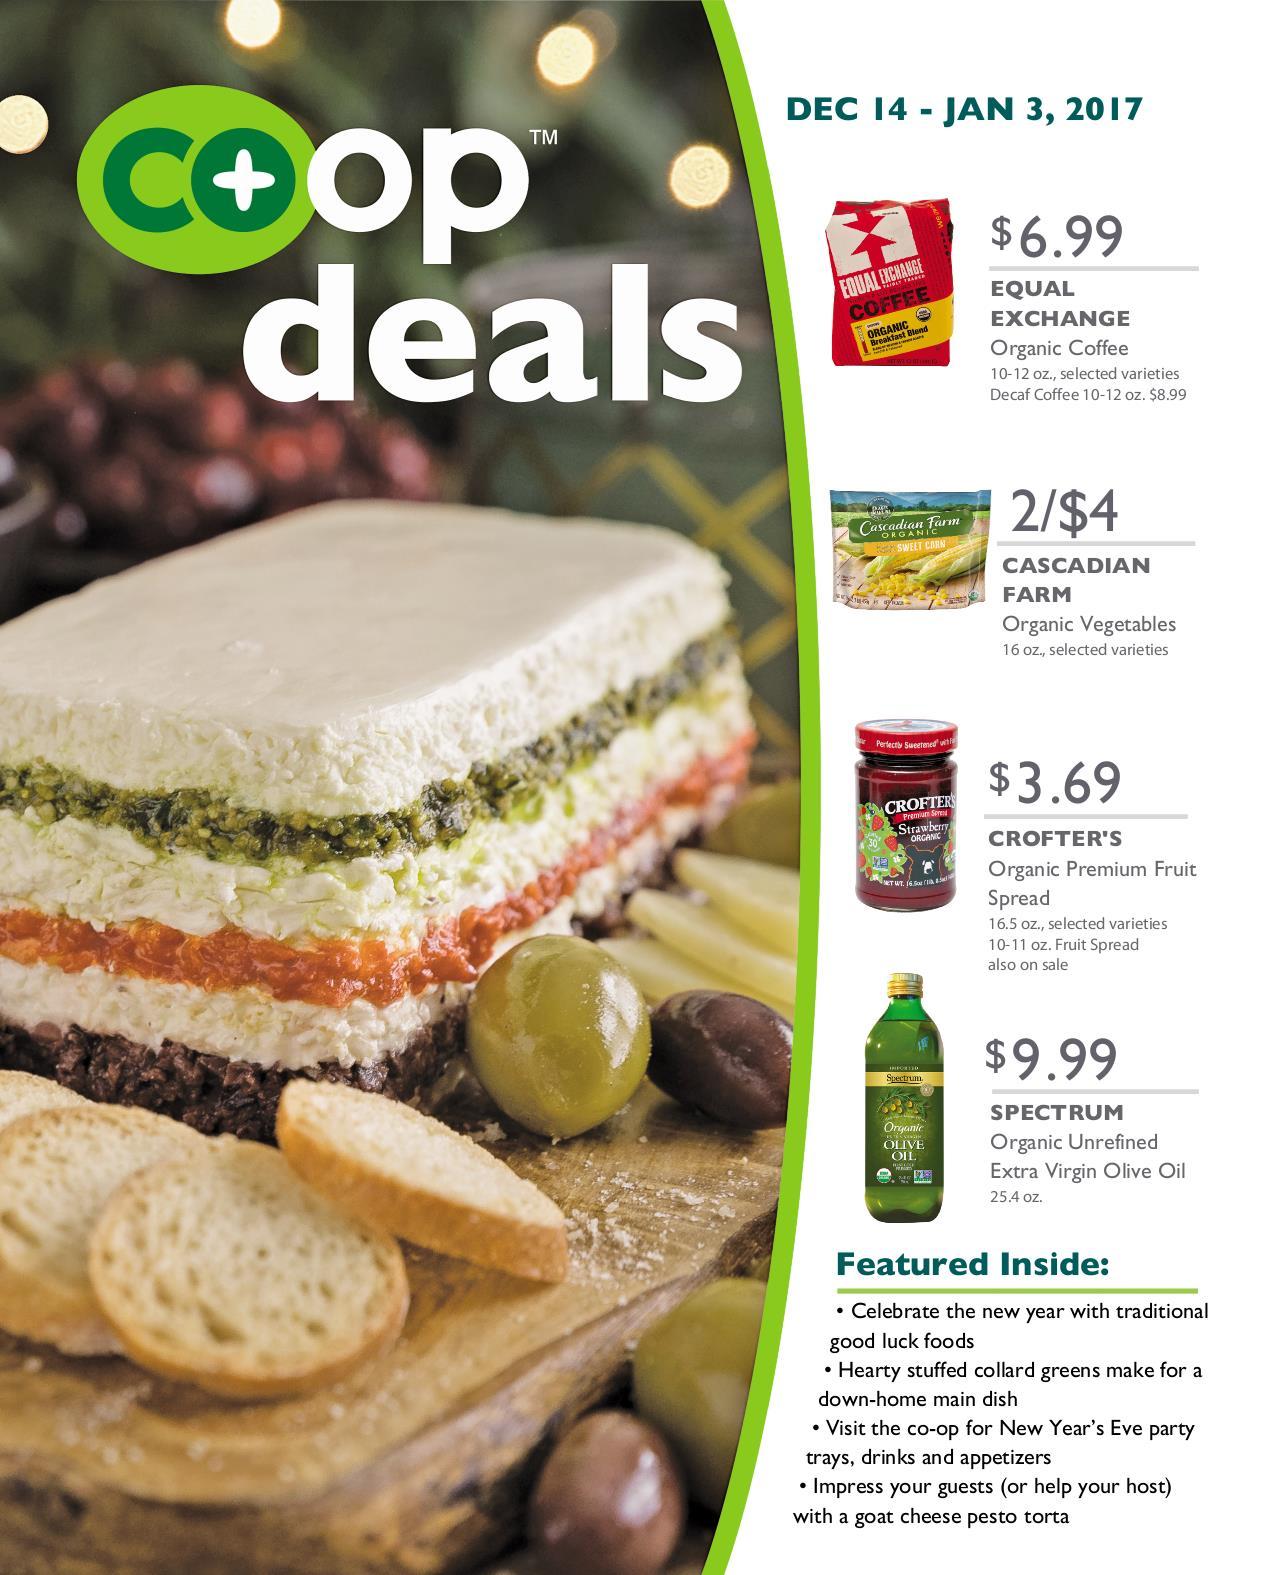 coop deals dec 2016 flyer b